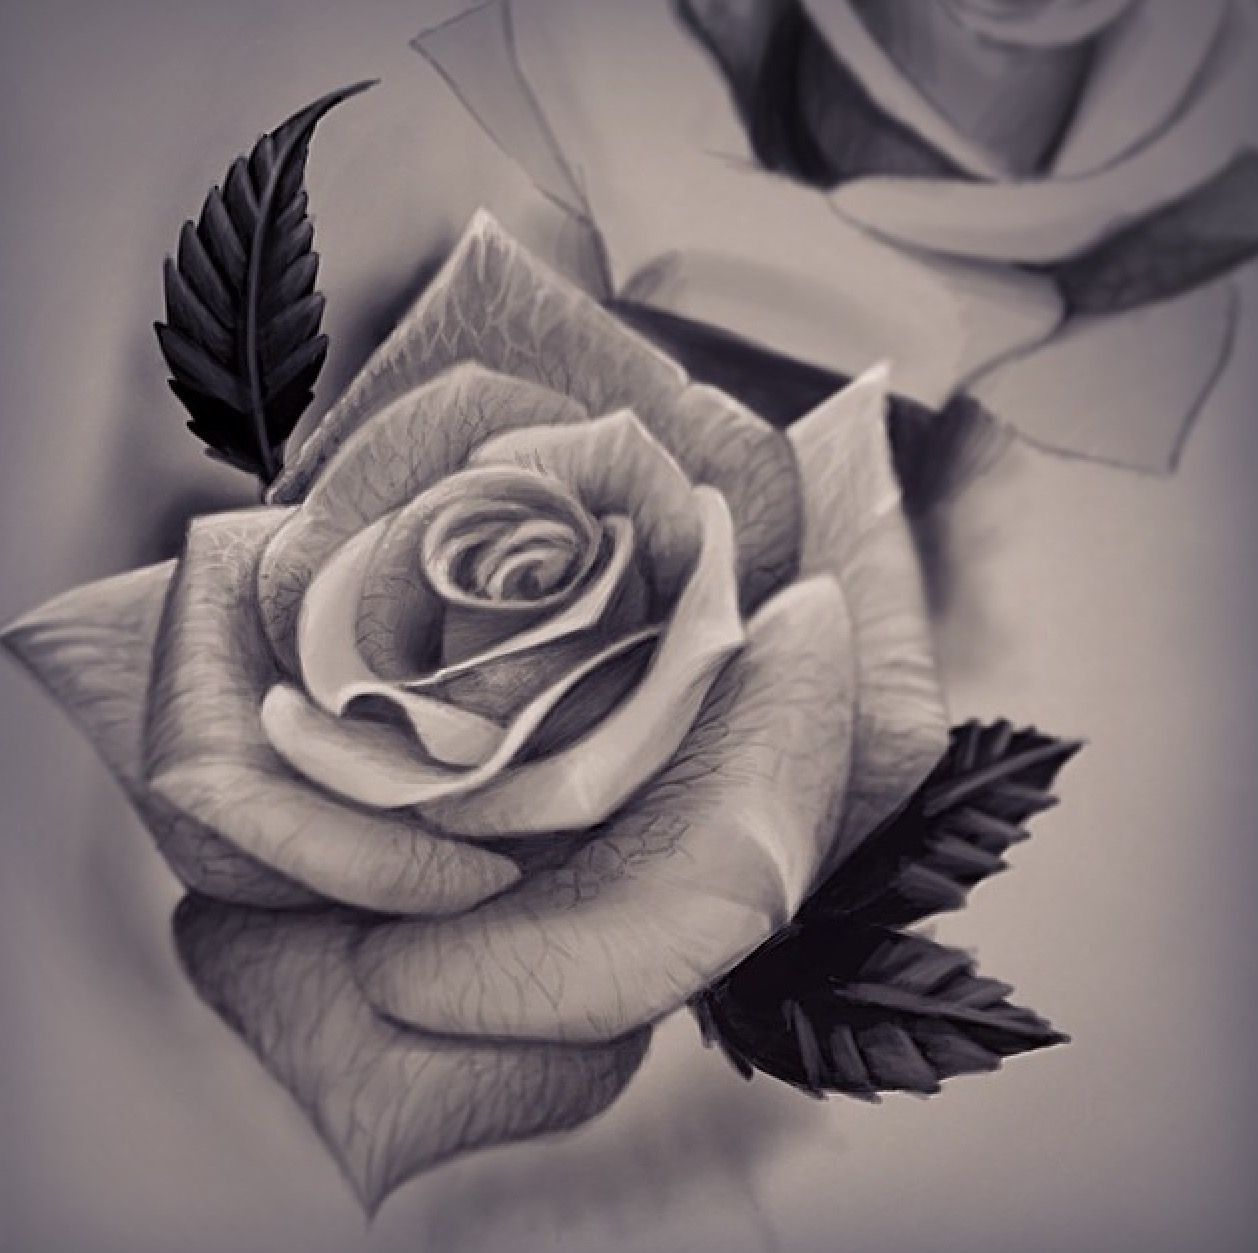 pin de vives virgen santa en flowers tatuajes de rosas tatuaje de rosa realista y dibujos de. Black Bedroom Furniture Sets. Home Design Ideas